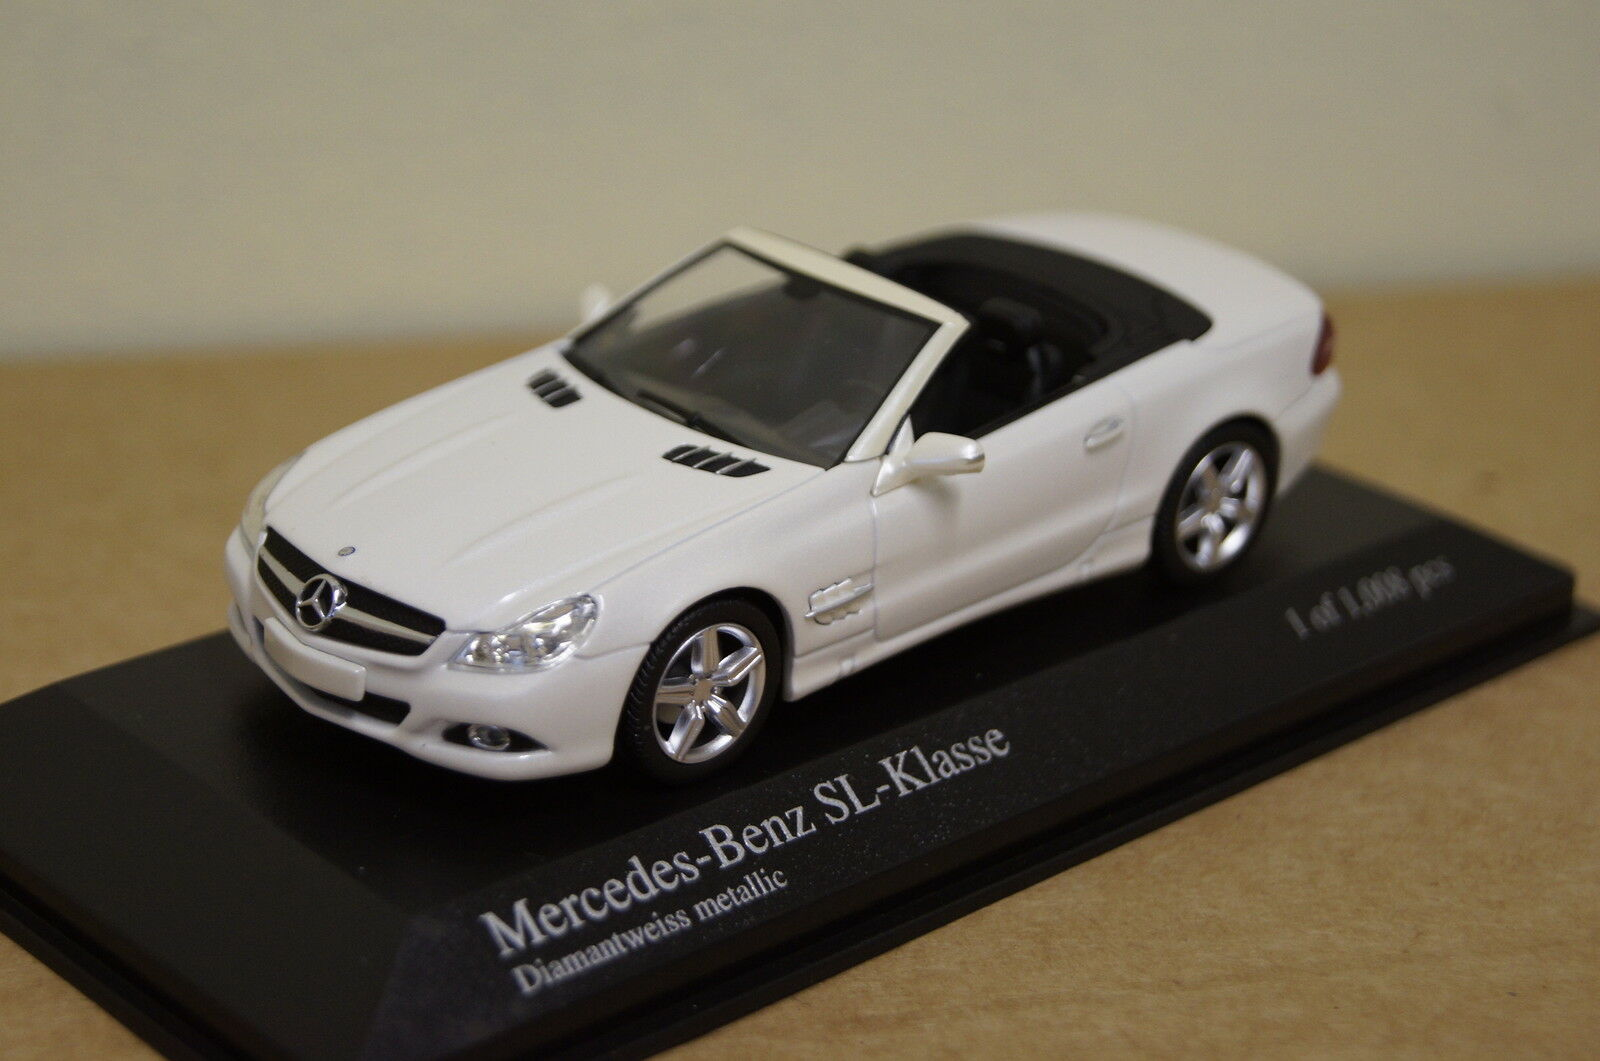 MERCEDES sl-classe 2008 (r230) Blanc met. 1 43 MINICHAMPS NEUF & OVP 430037530